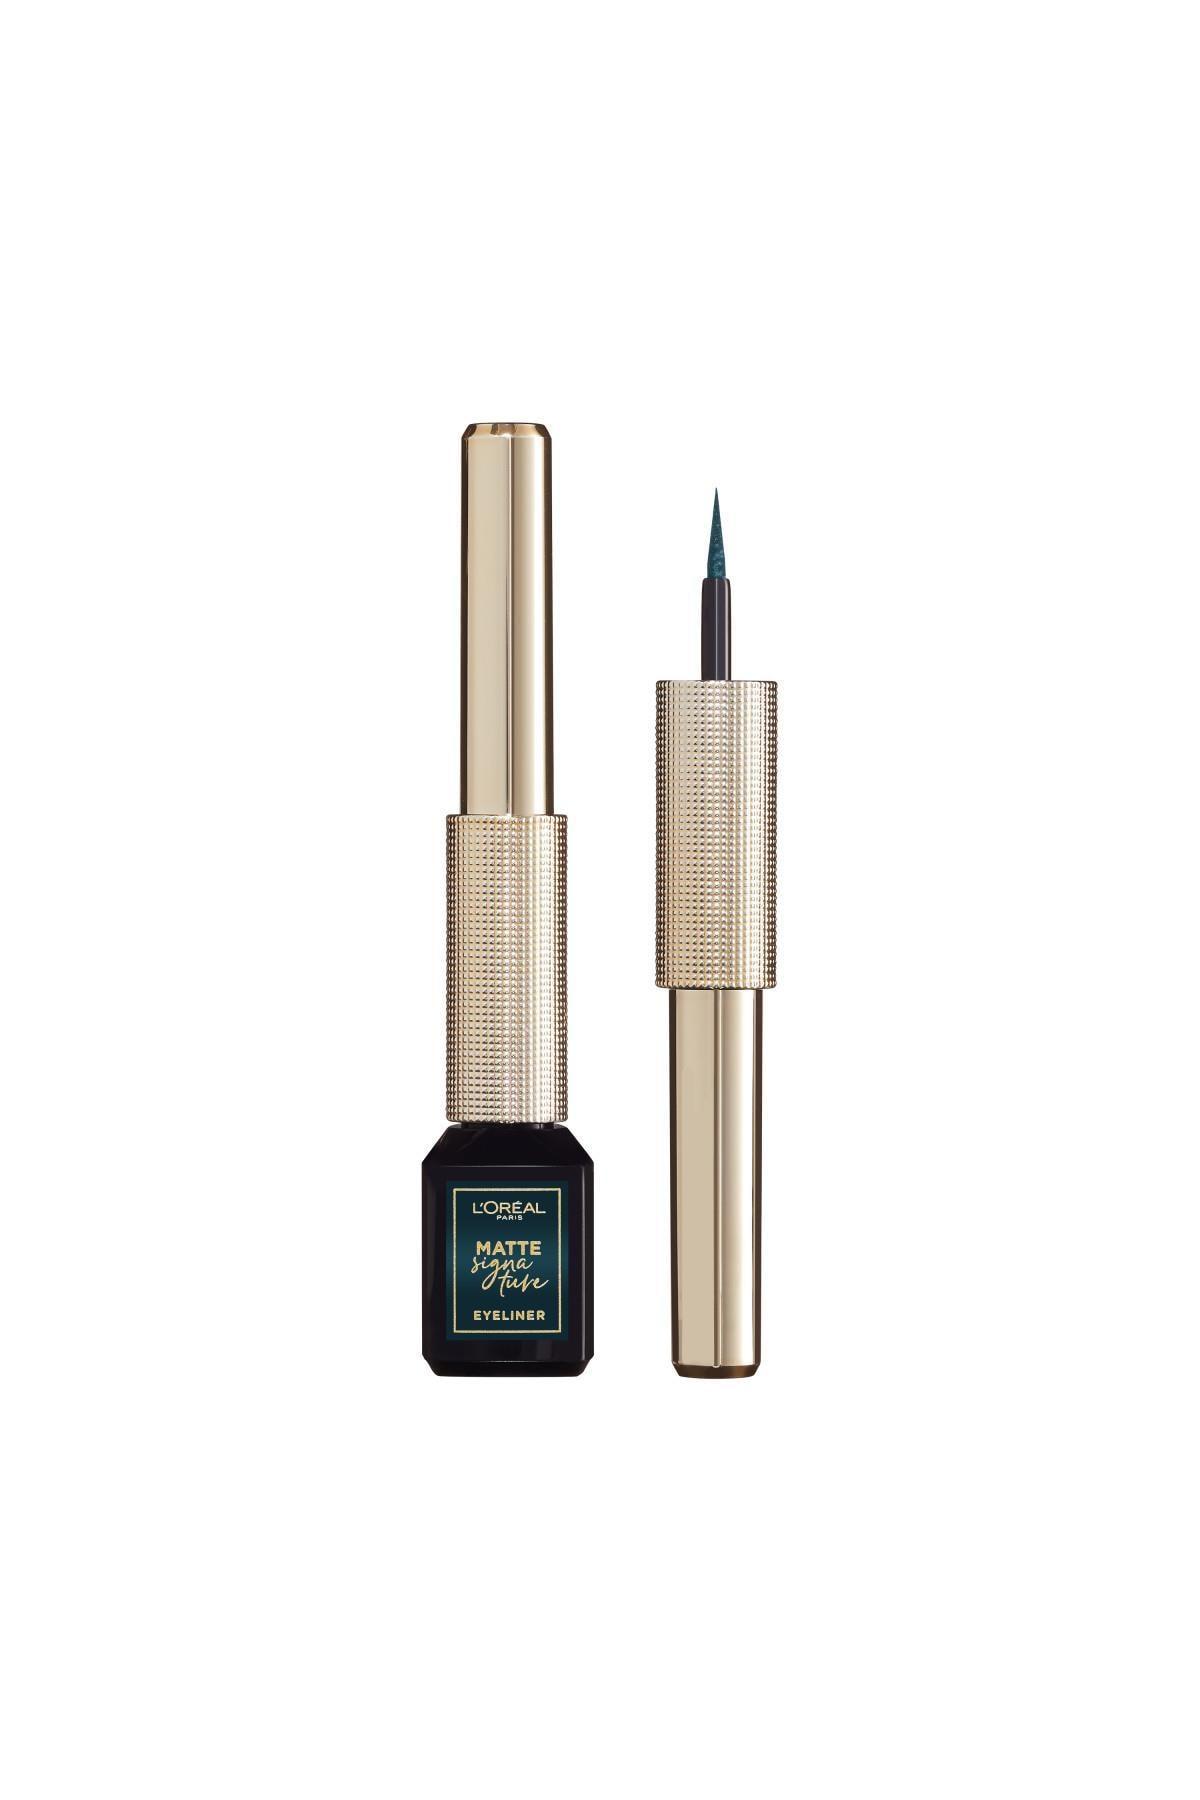 L'Oreal Paris Mat Eyeliner - Matte Signature Eyeliner 04 Emeraude 30175259